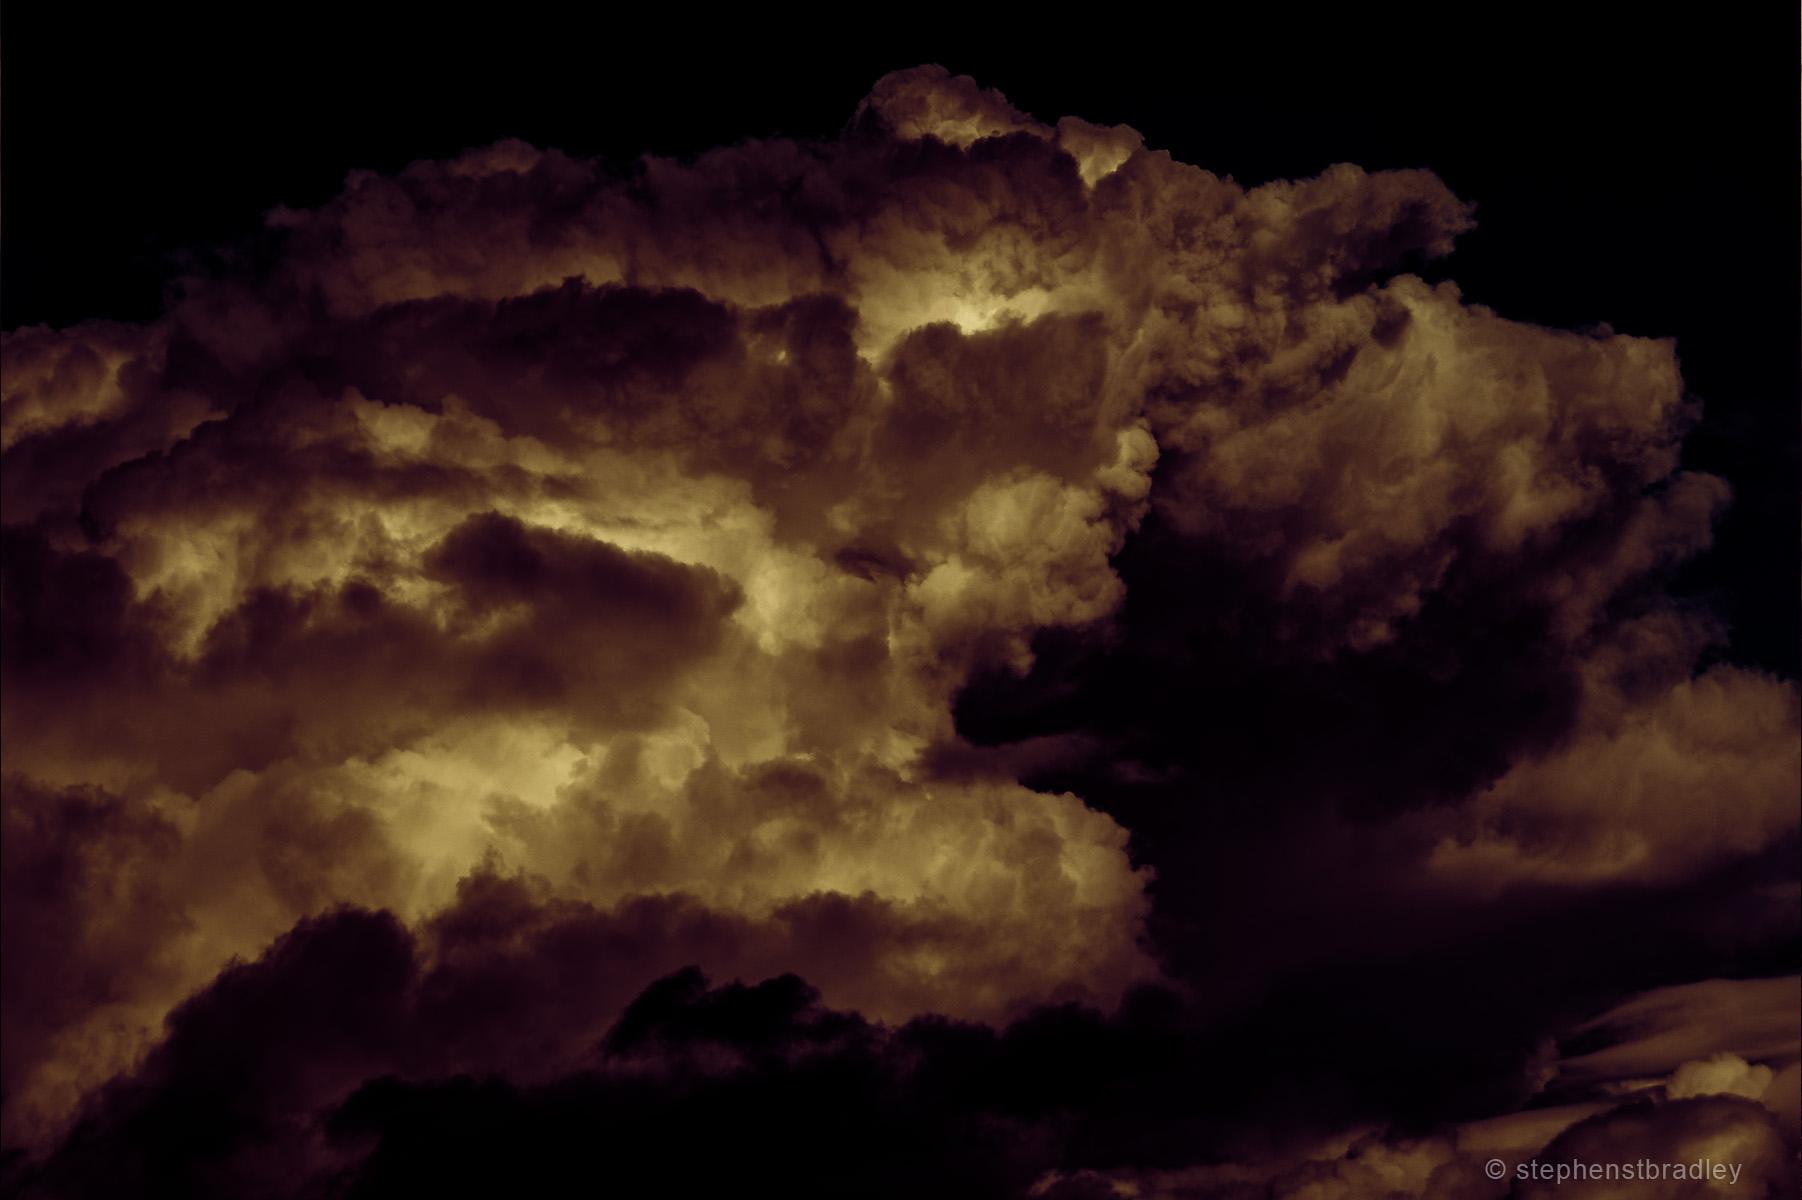 Skypig. Limited edition photo of Ireland - Stephen S T Bradley, professional landscape photographer UK and USA